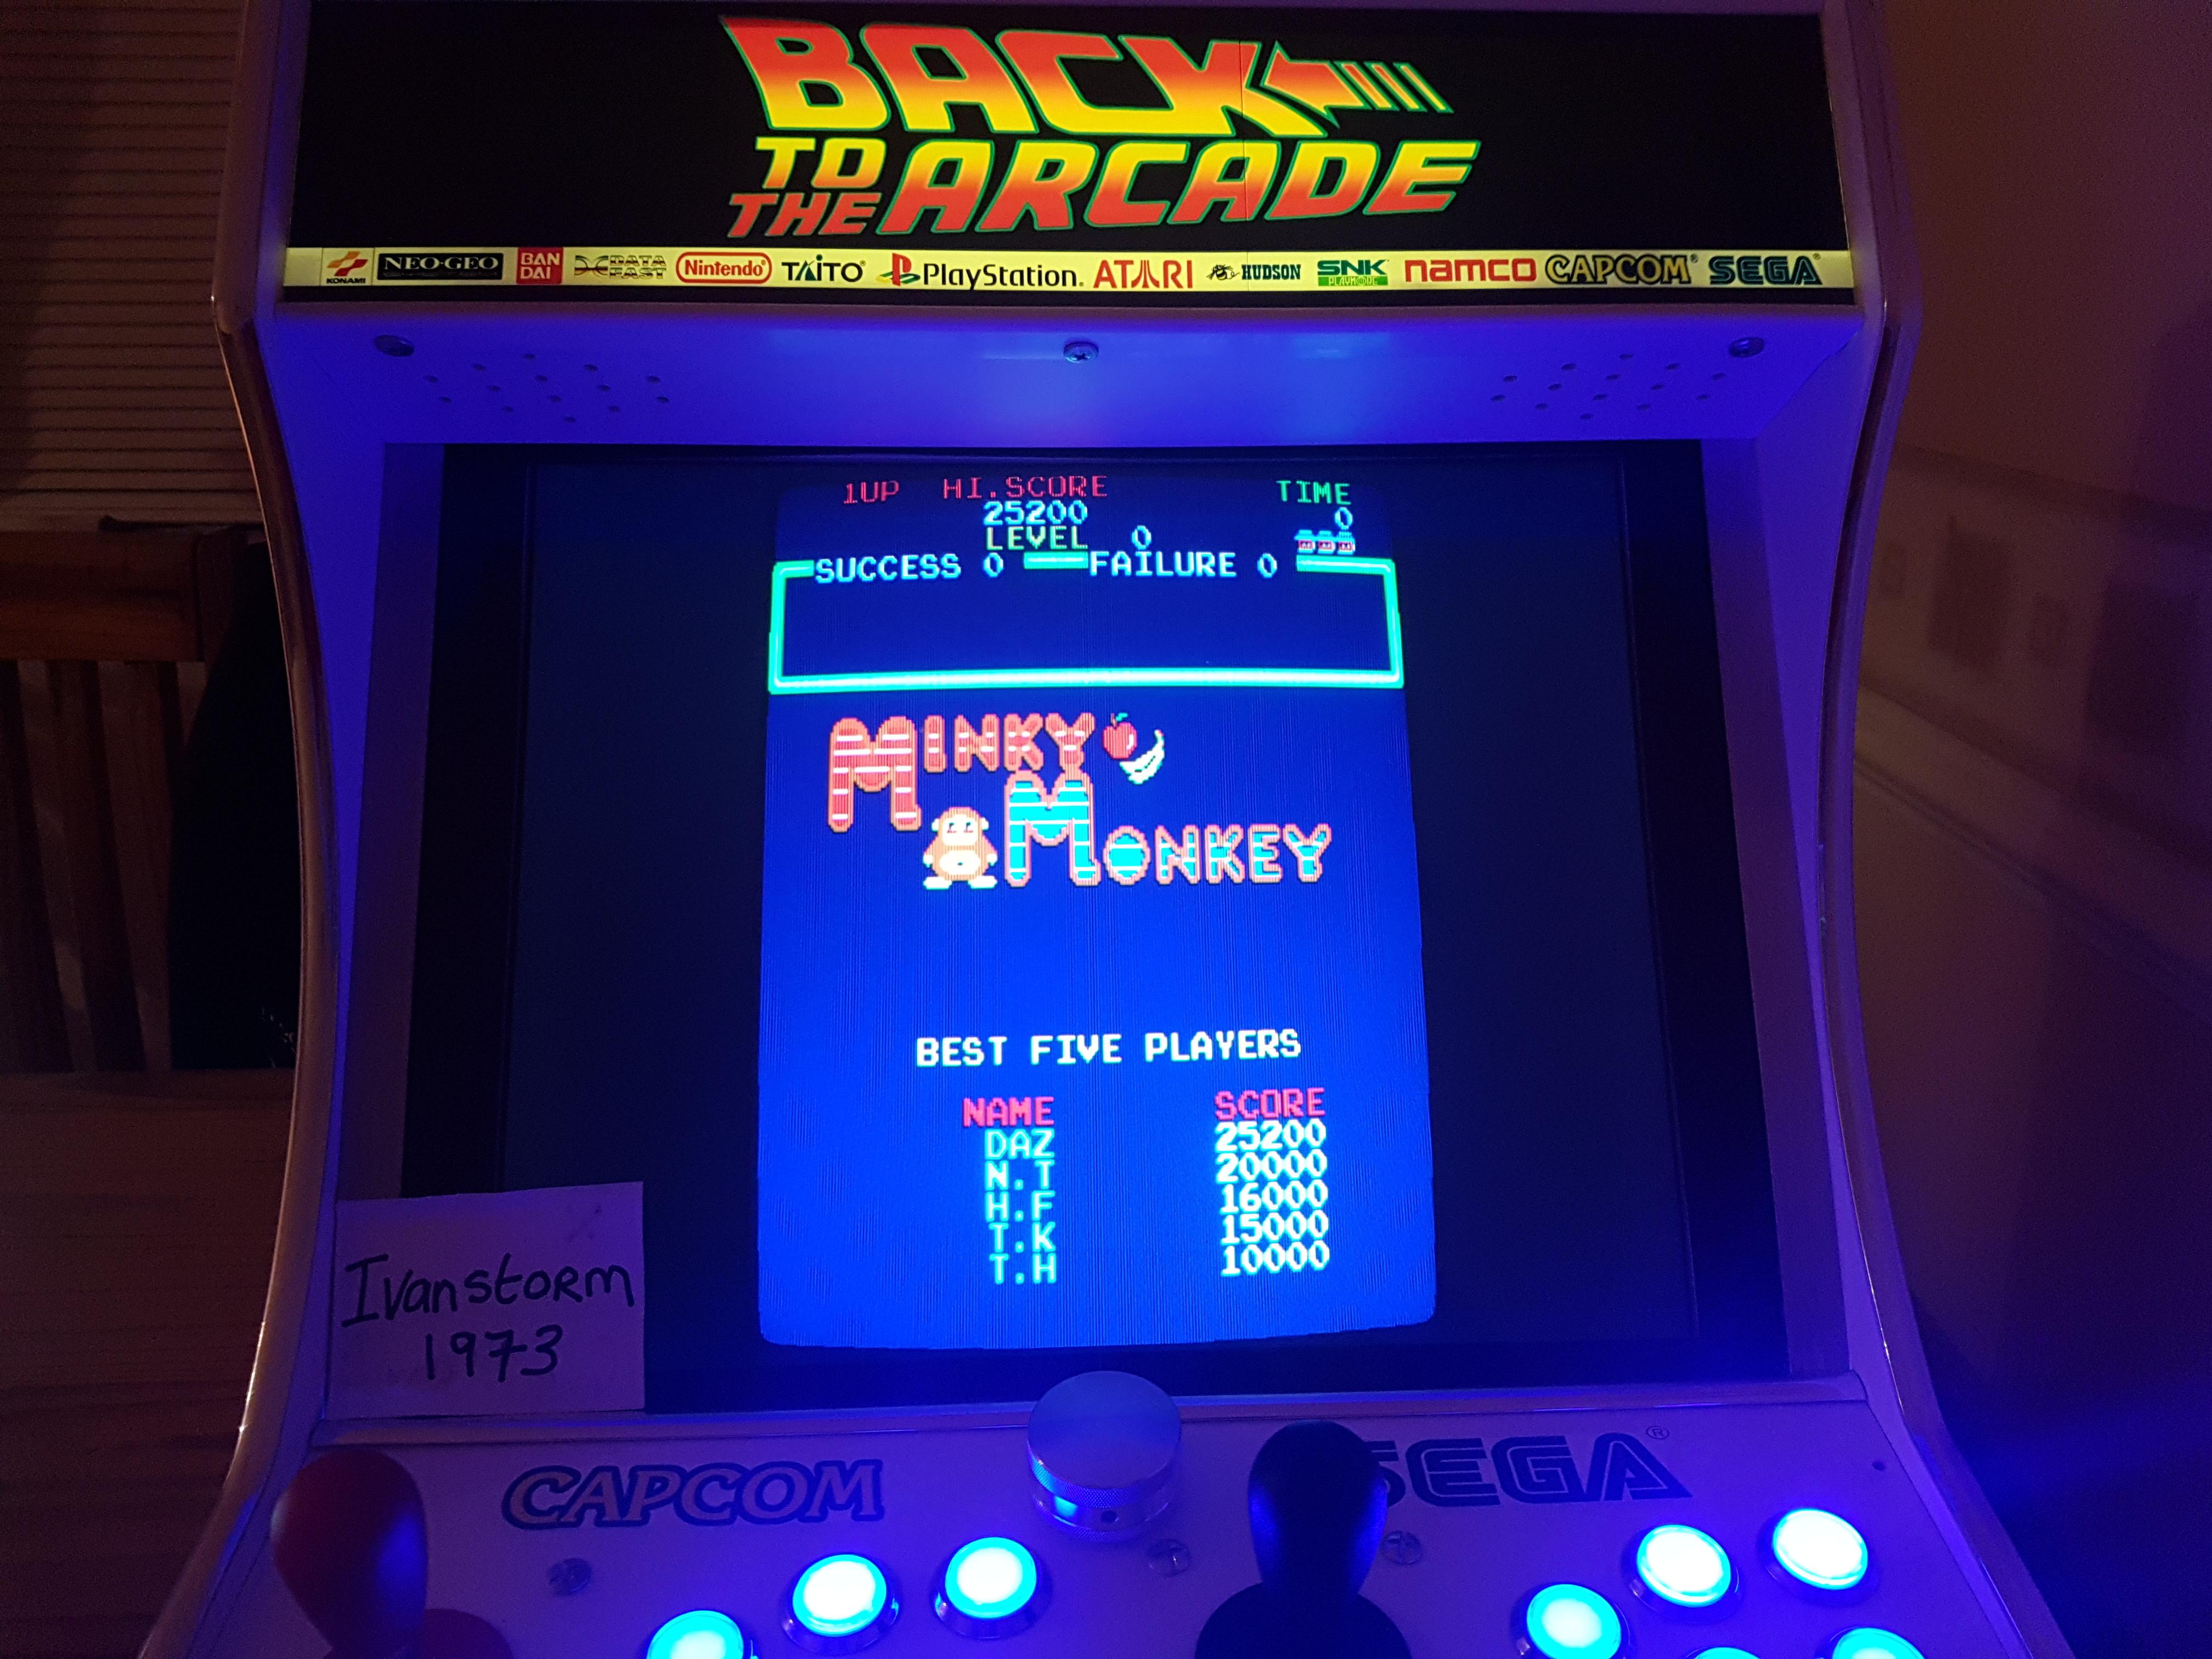 Ivanstorm1973: Minky Monkey [mmonkey] (Arcade Emulated / M.A.M.E.) 25,200 points on 2017-11-24 15:59:33